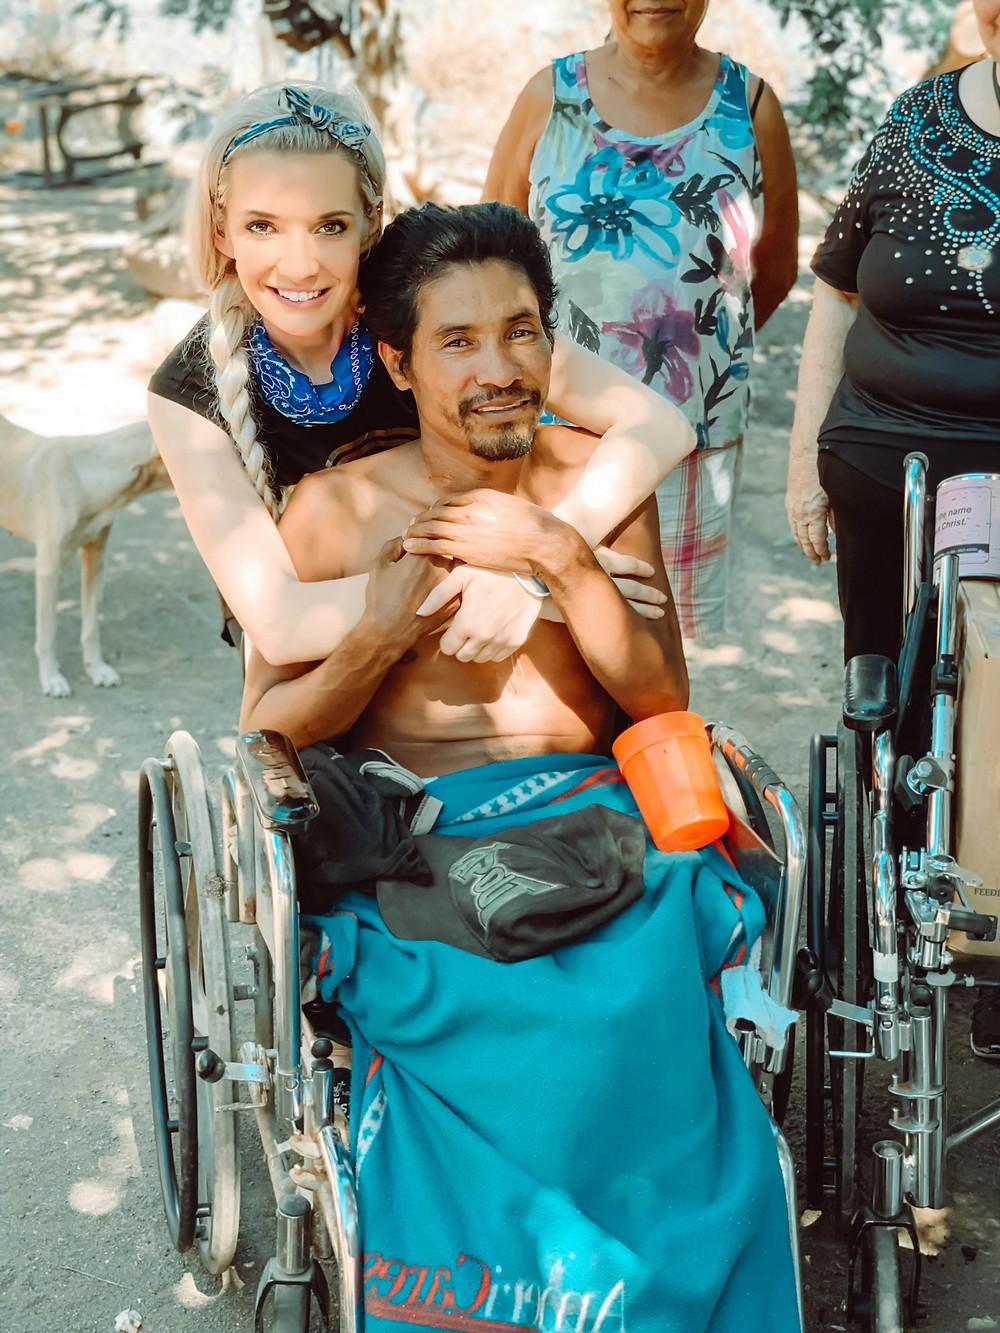 Amanda. Sowards Missionary in Nicaragua